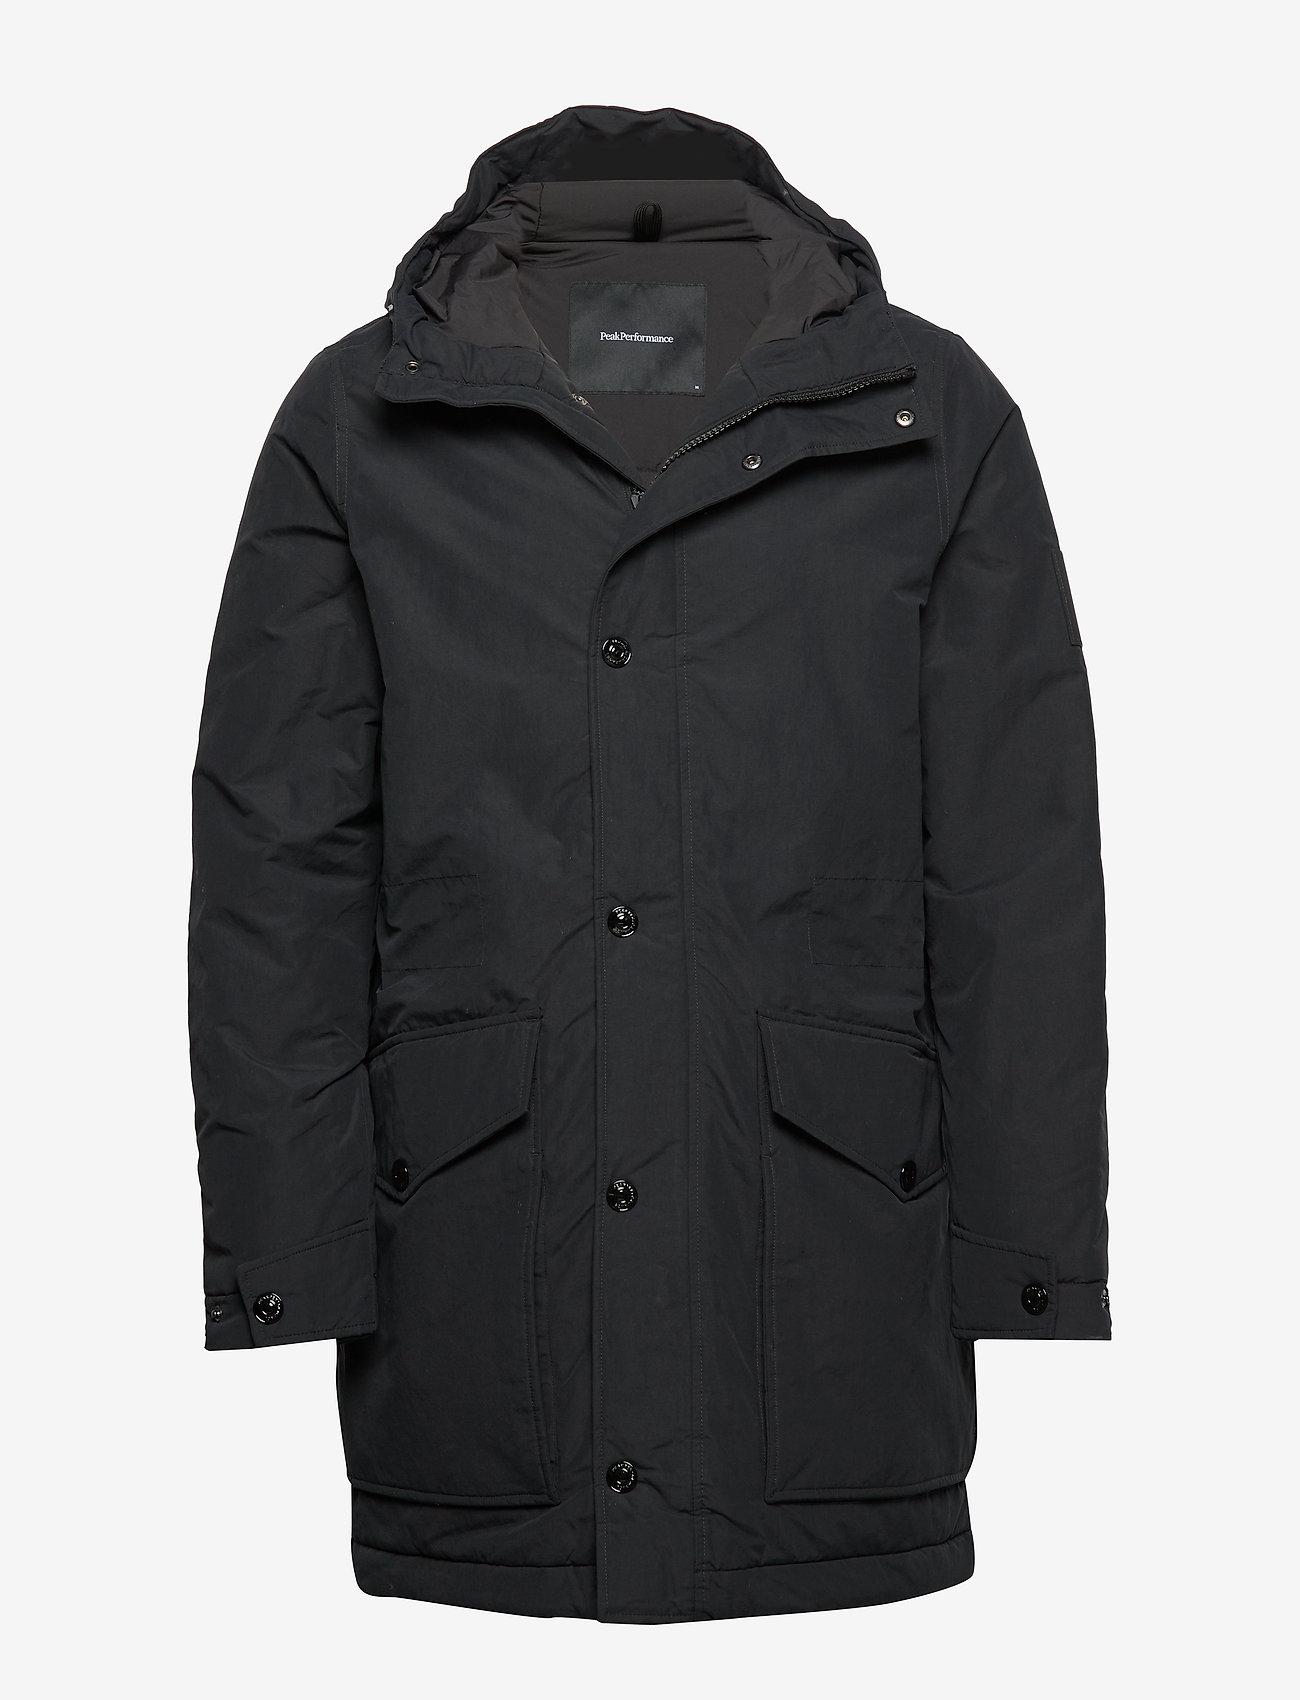 Peak Performance - TYPHON J - insulated jackets - black - 0